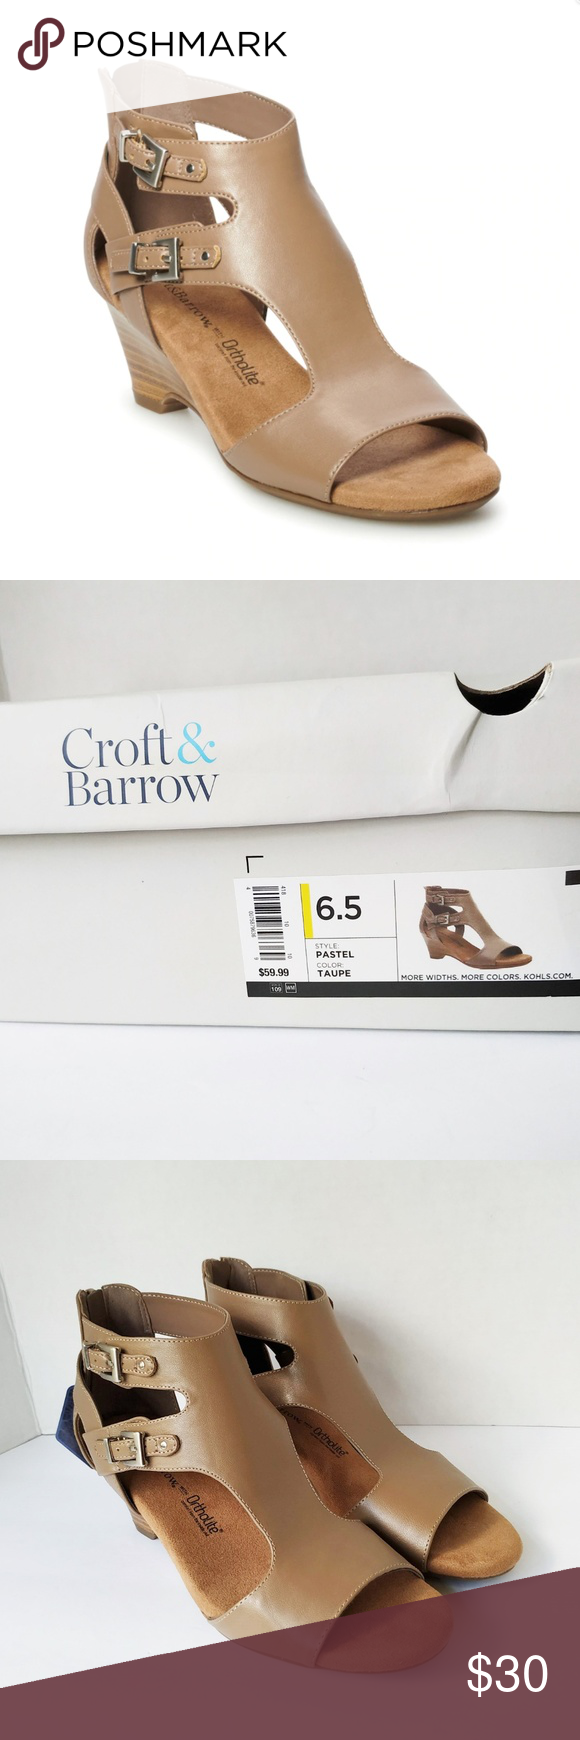 croft and barrow ortholite wedge